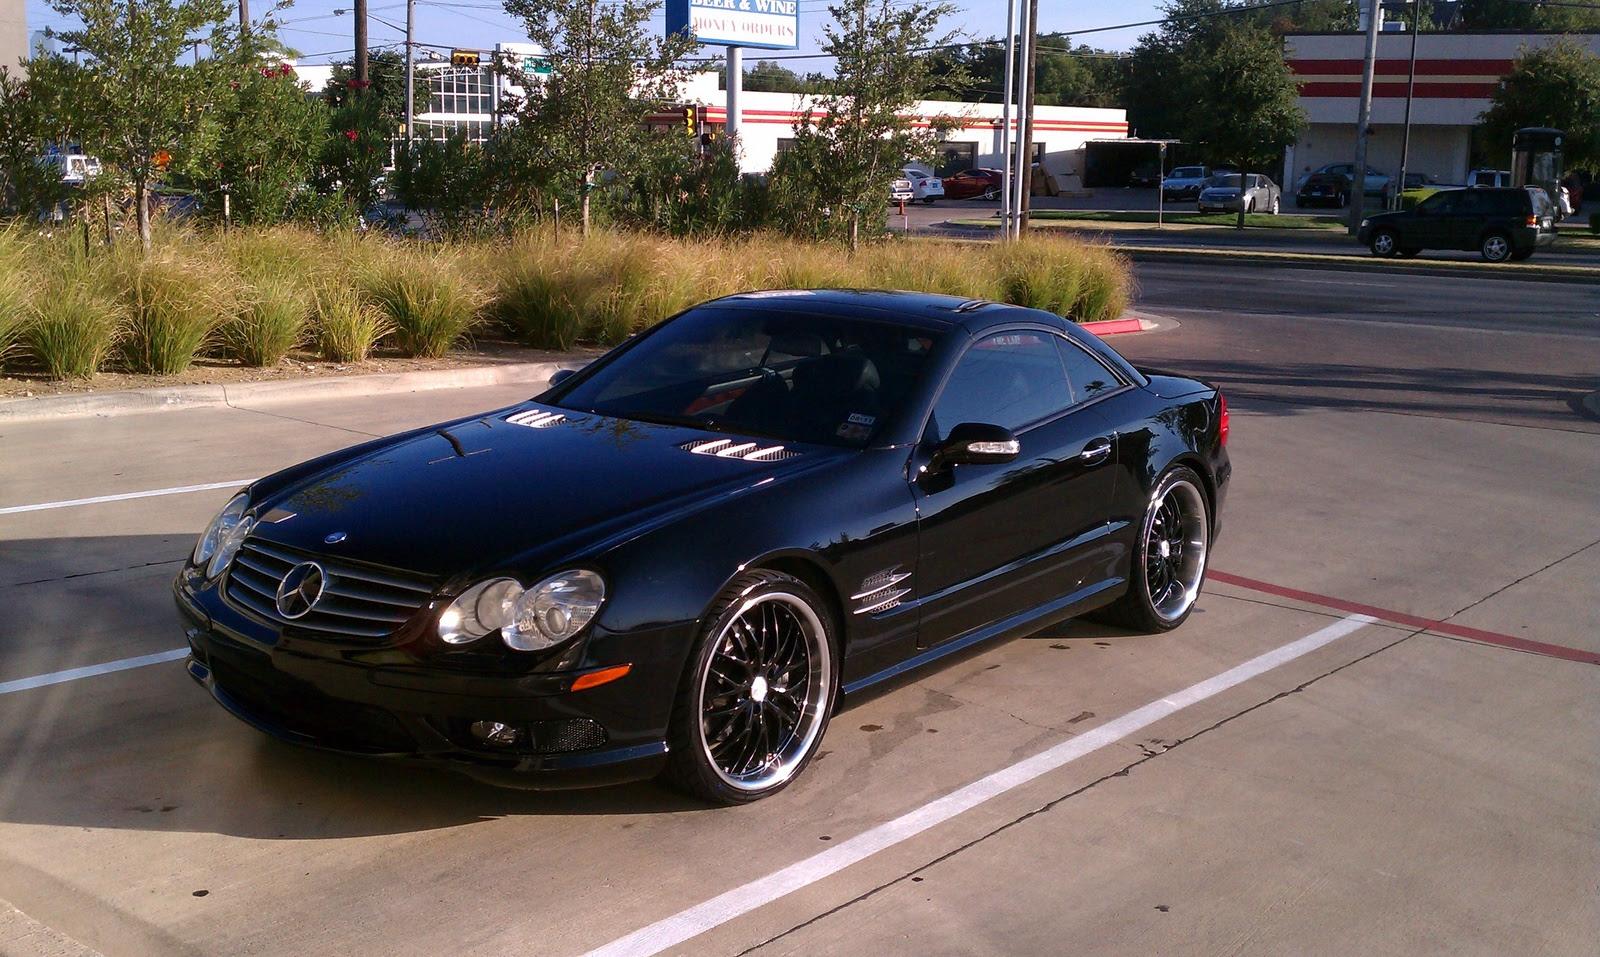 2003 Mercedes-Benz SL-Class - Pictures - CarGurus